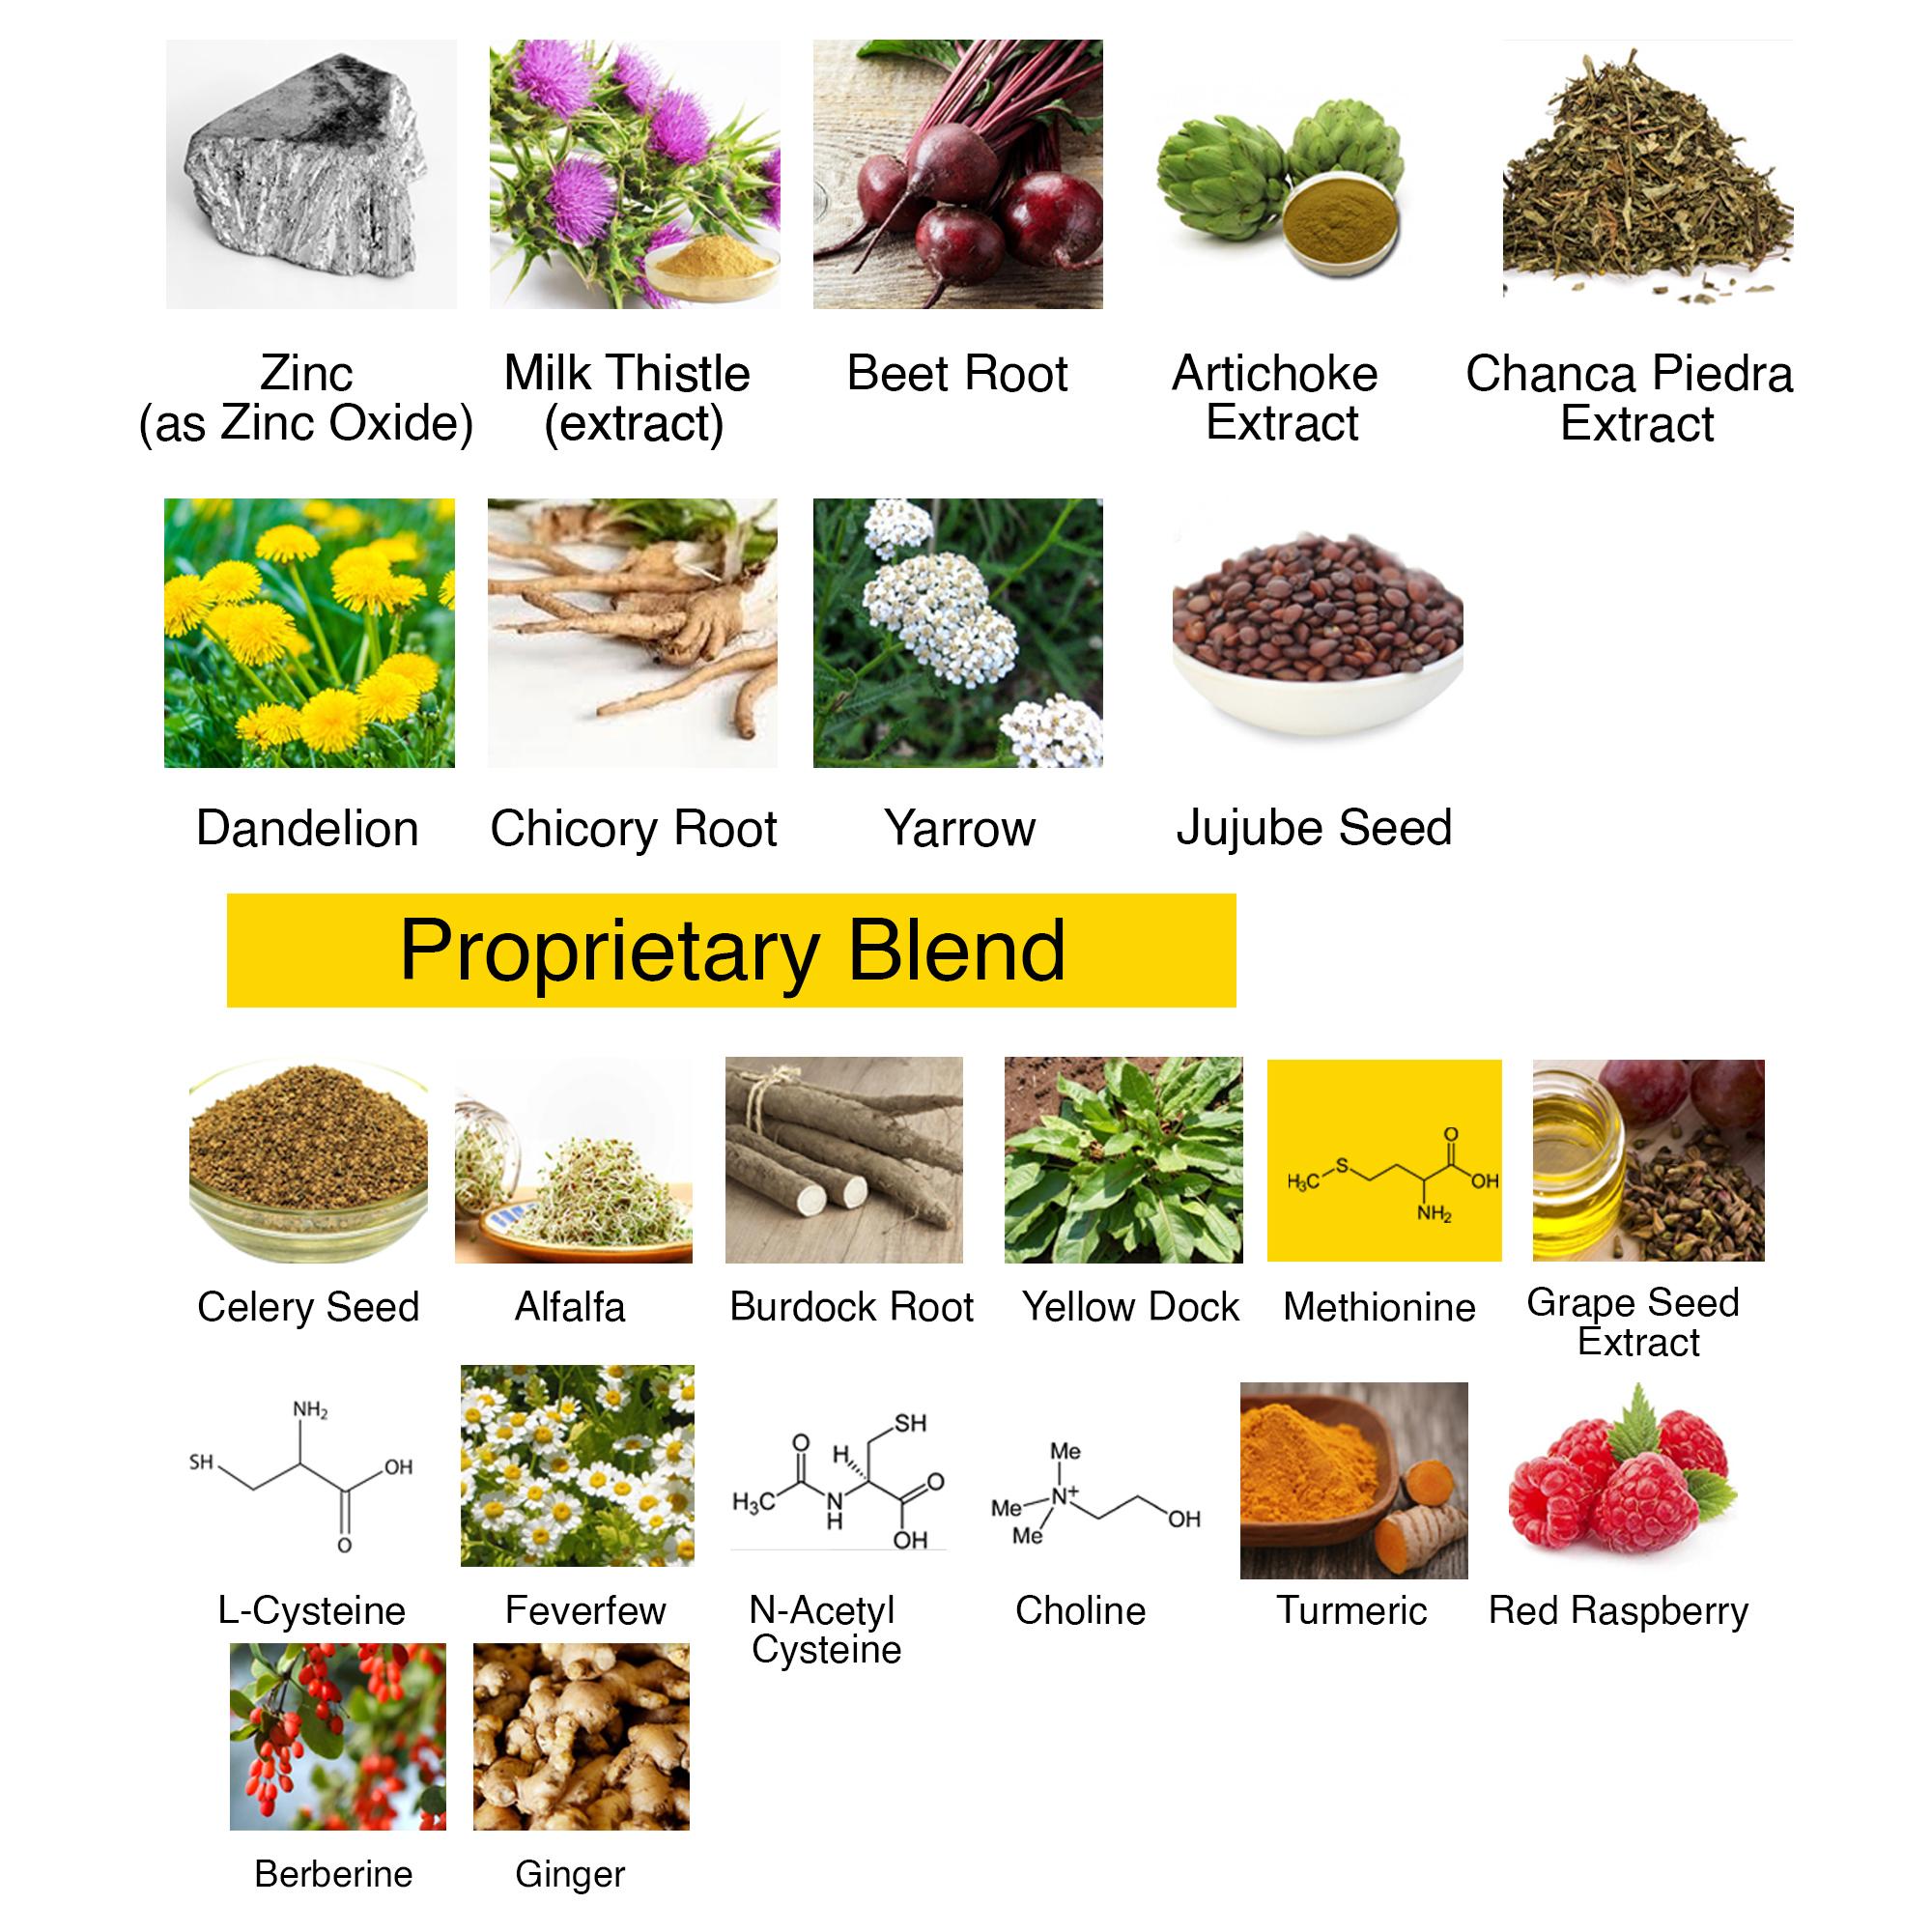 Leptitox ingredients